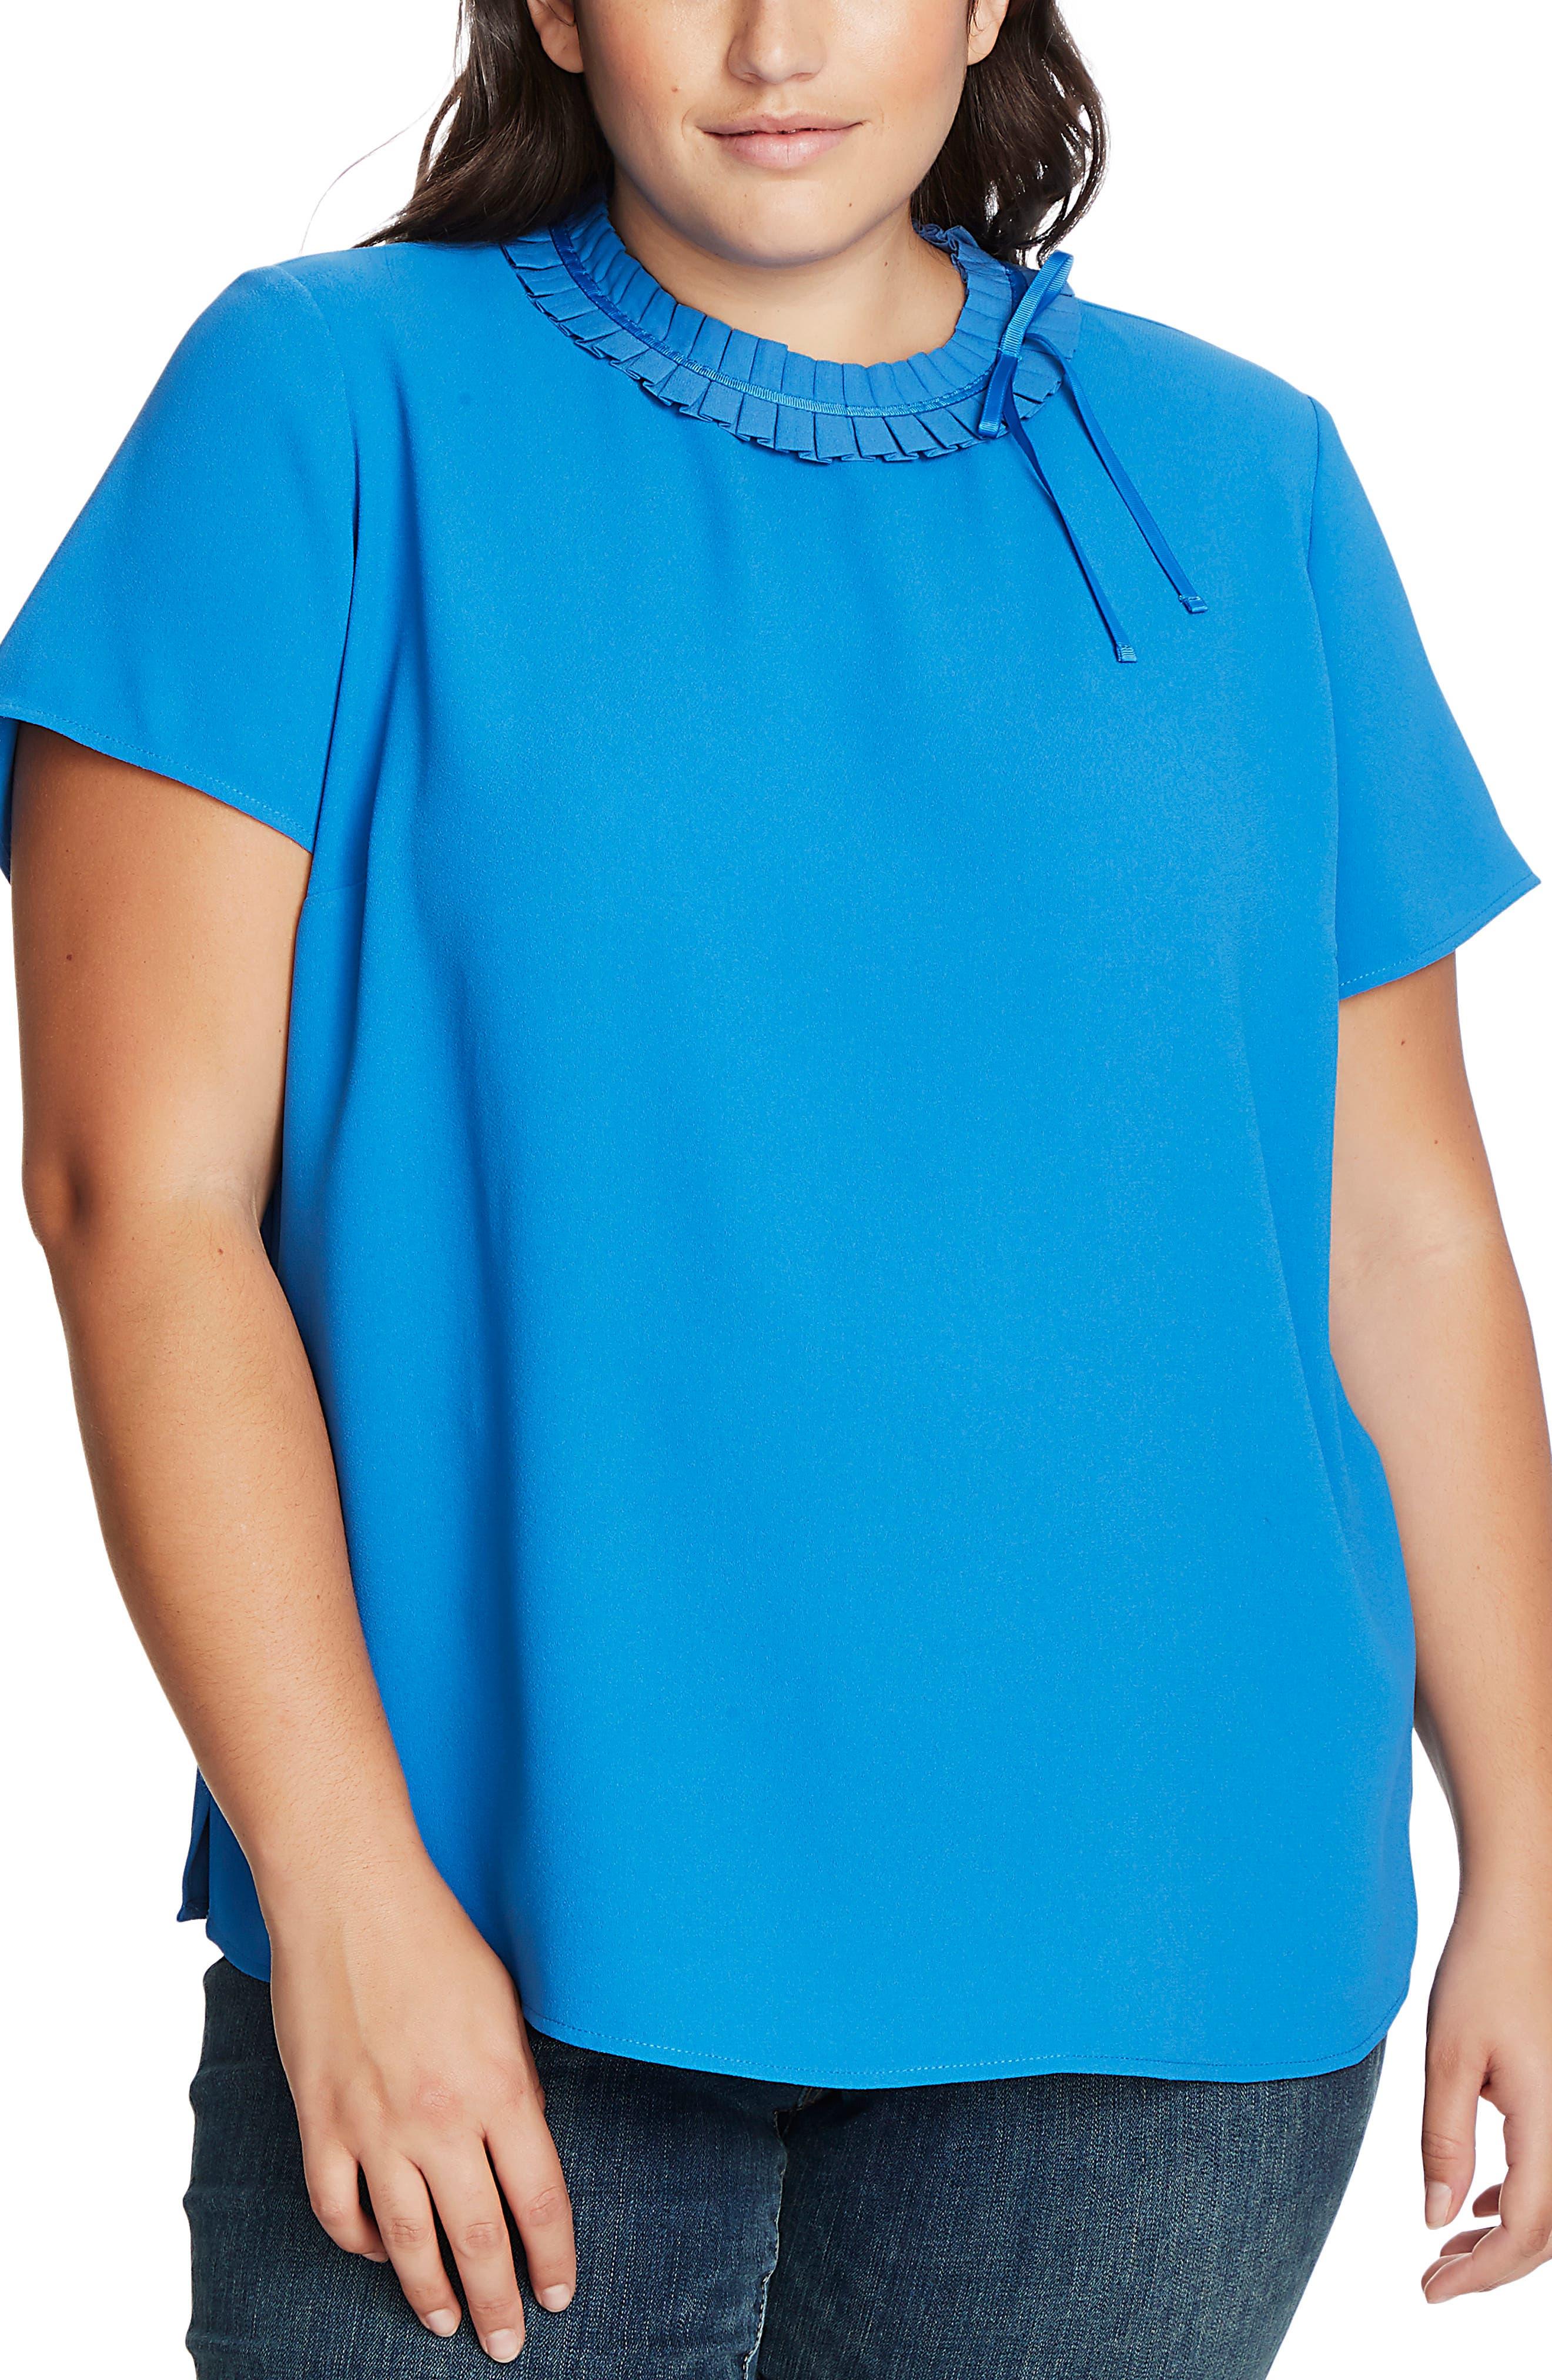 1930s Style Blouses, Shirts, Tops | Vintage Blouses Plus Size Womens Cece Pleated Collar Short Sleeve Crepe Blouse $53.40 AT vintagedancer.com